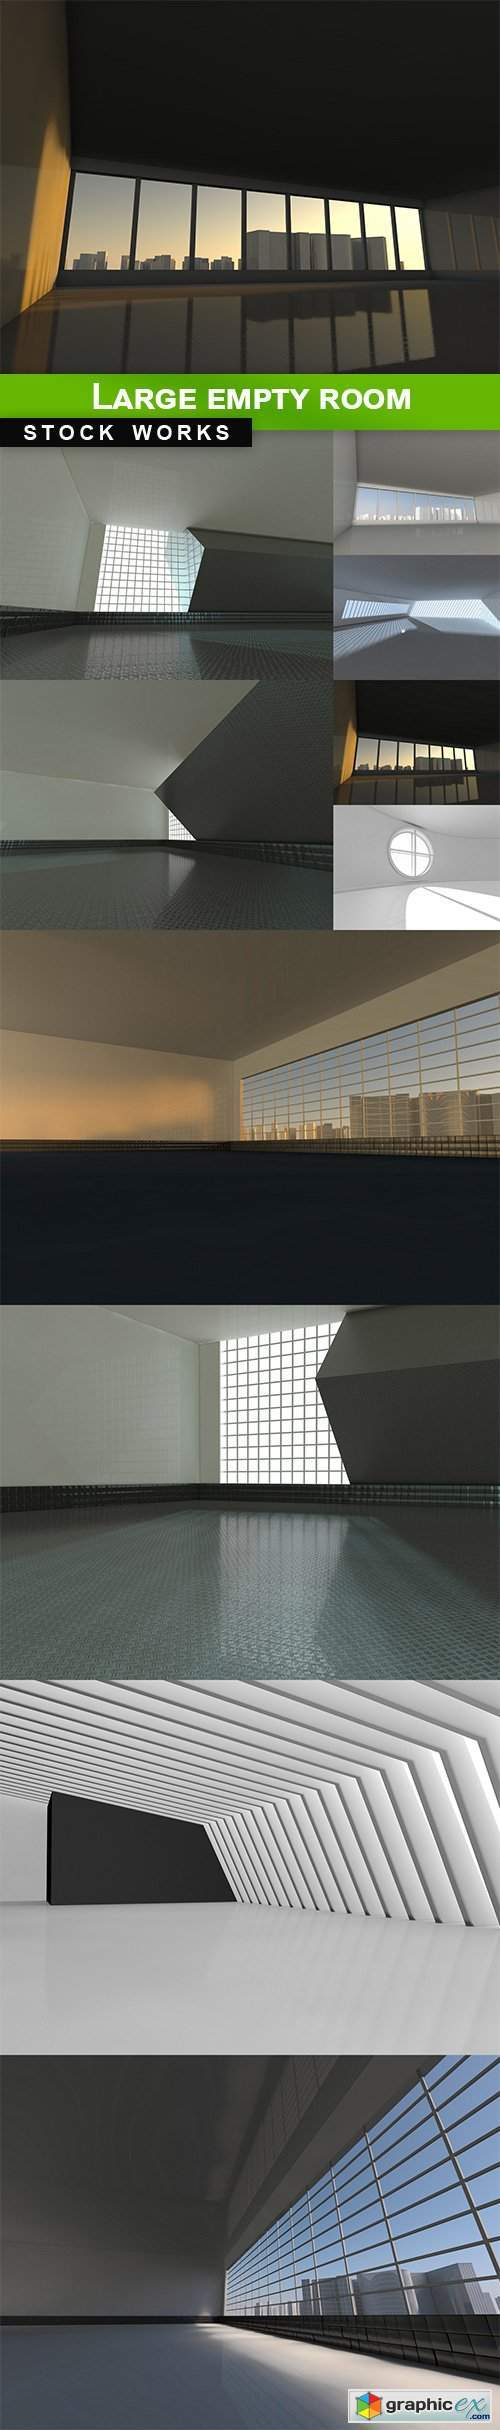 Large empty room - 10 UHQ JPEG